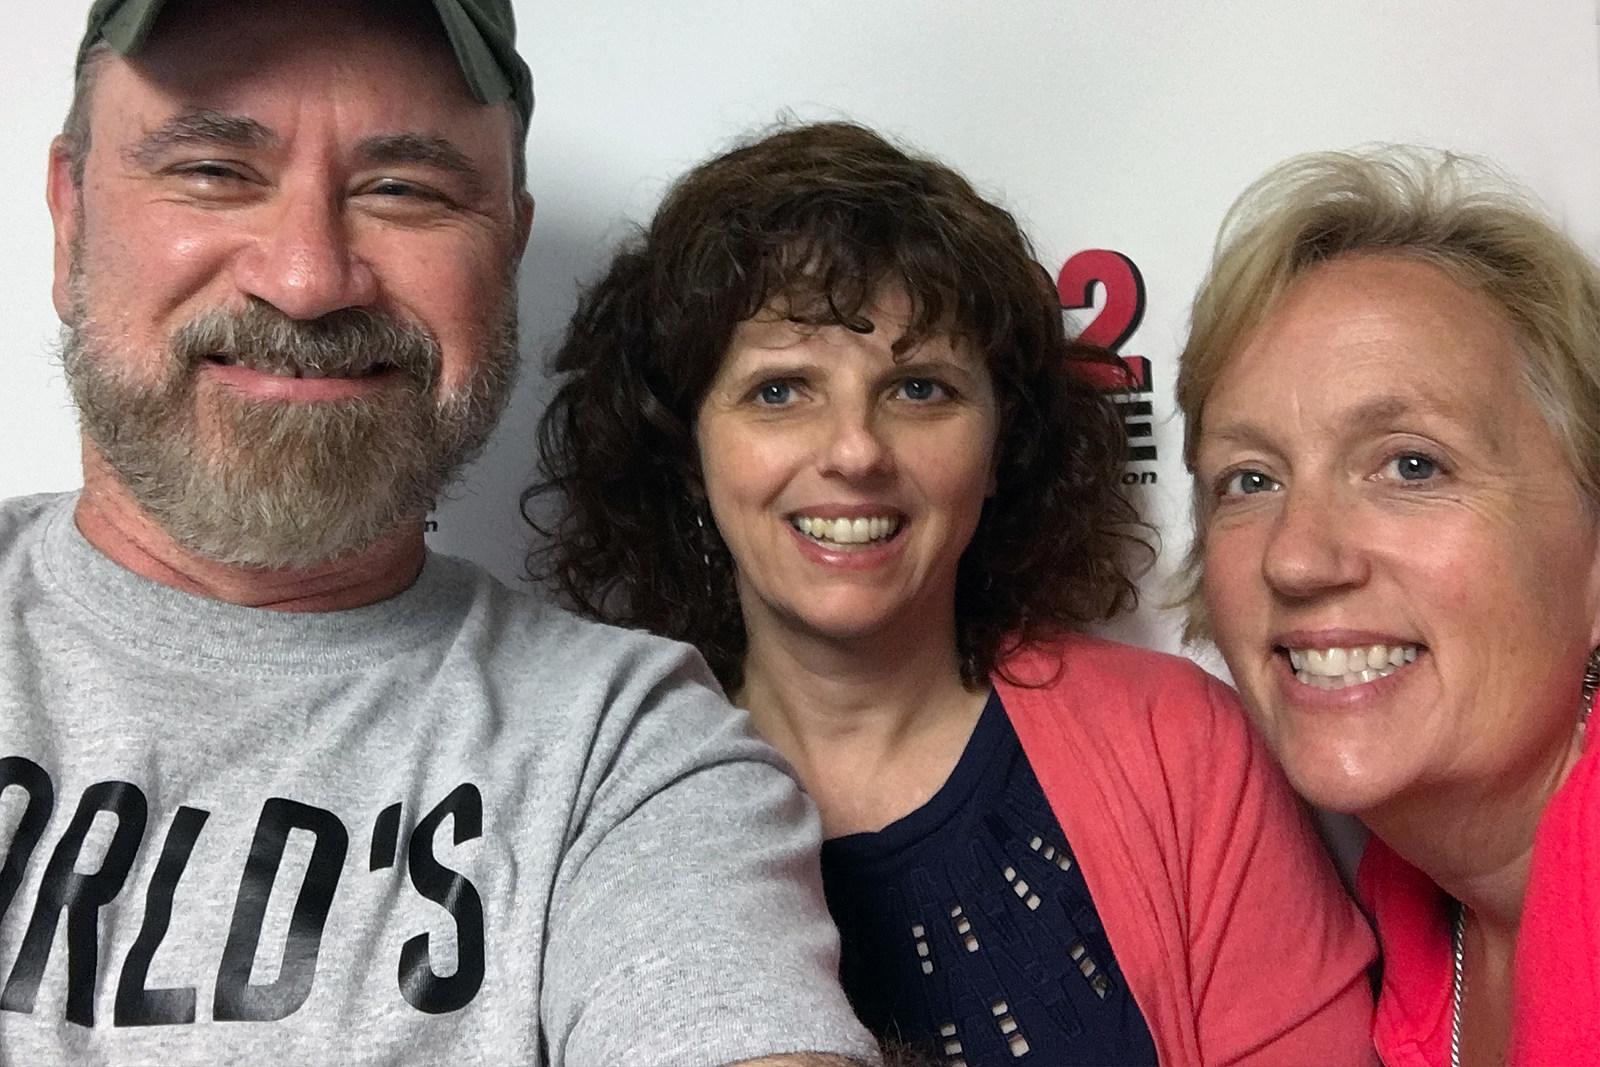 Mac Dickson, Rebecca Grover, Renee Nelson